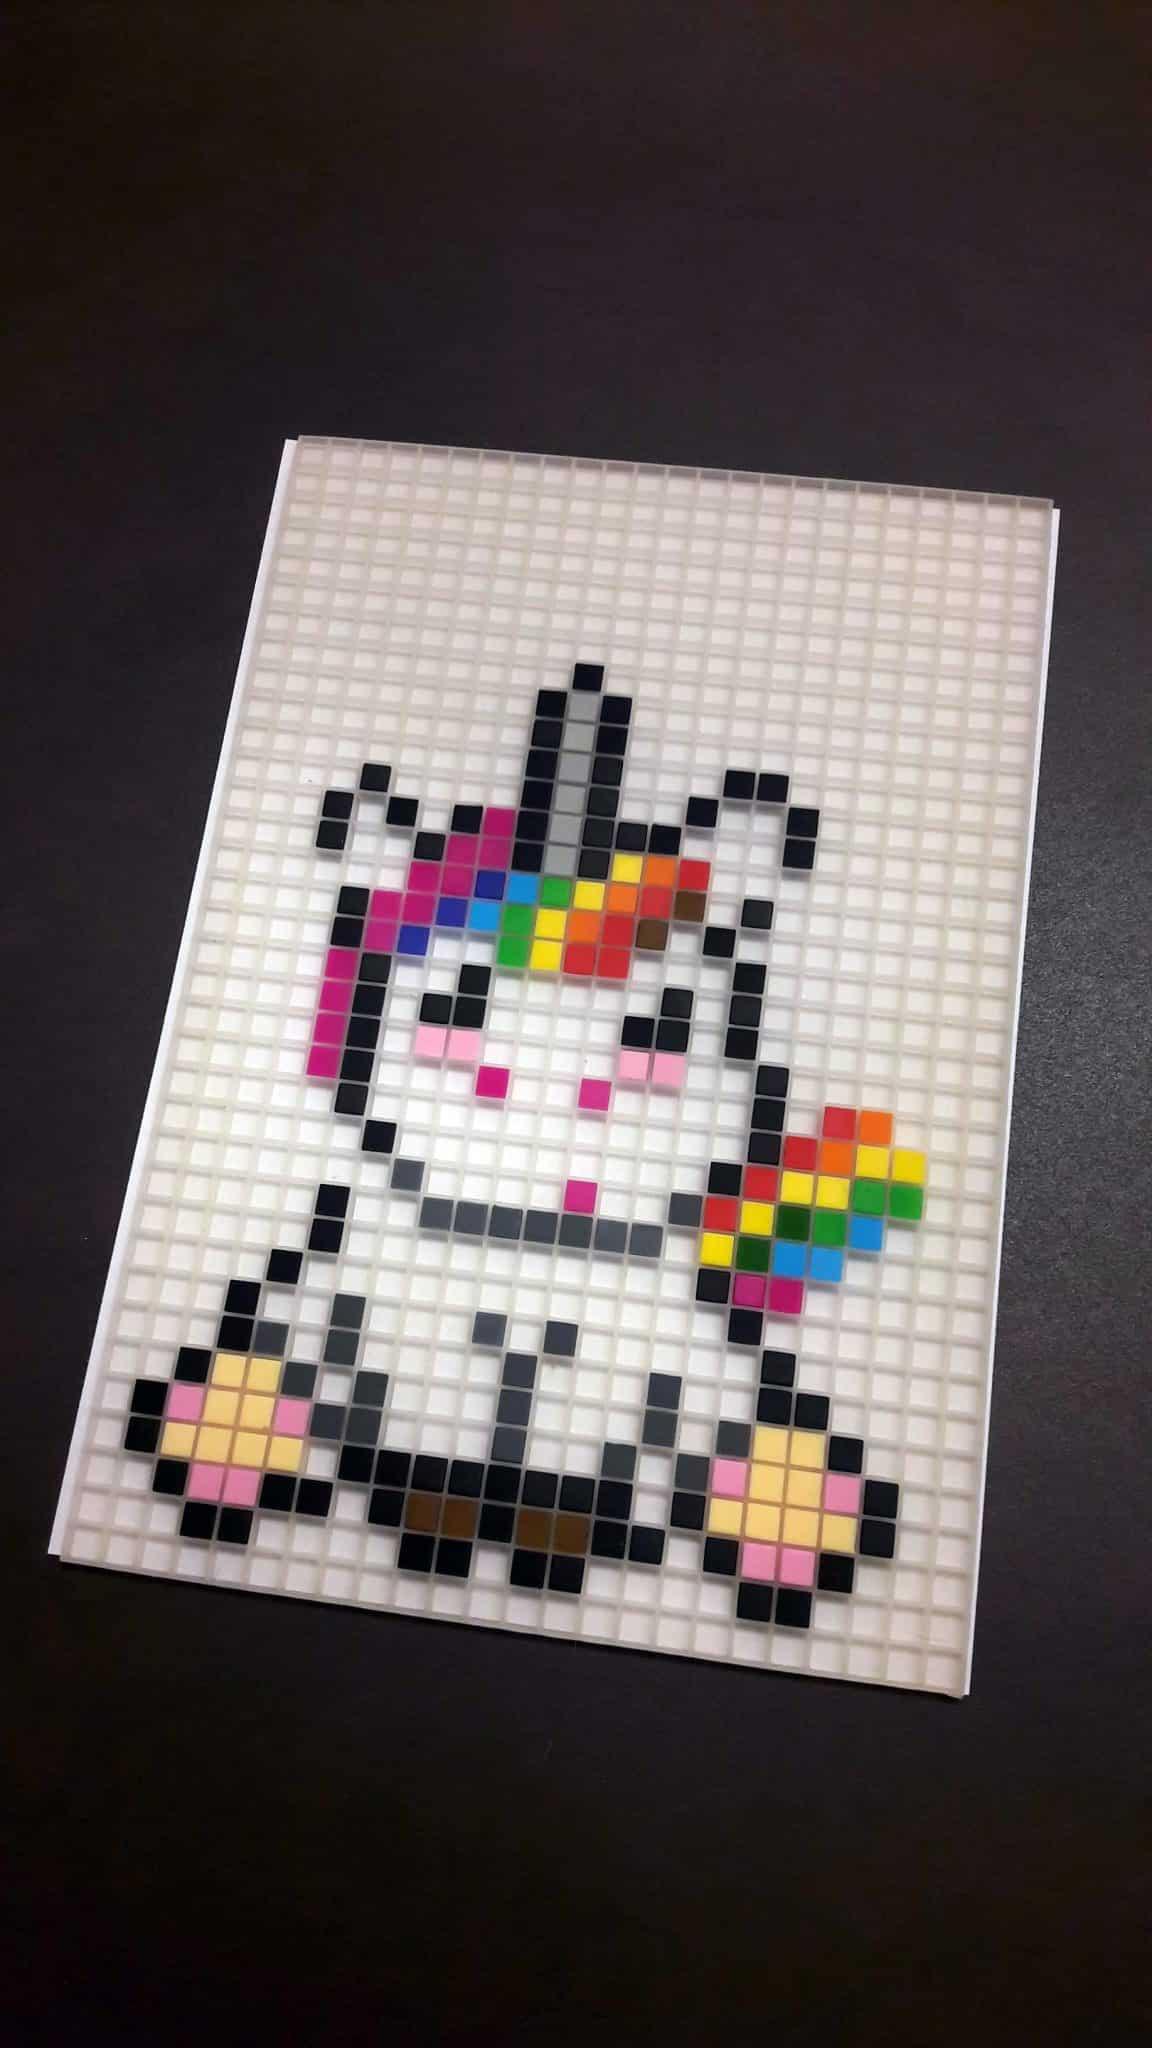 Modele Petit Pixel Art Licorne